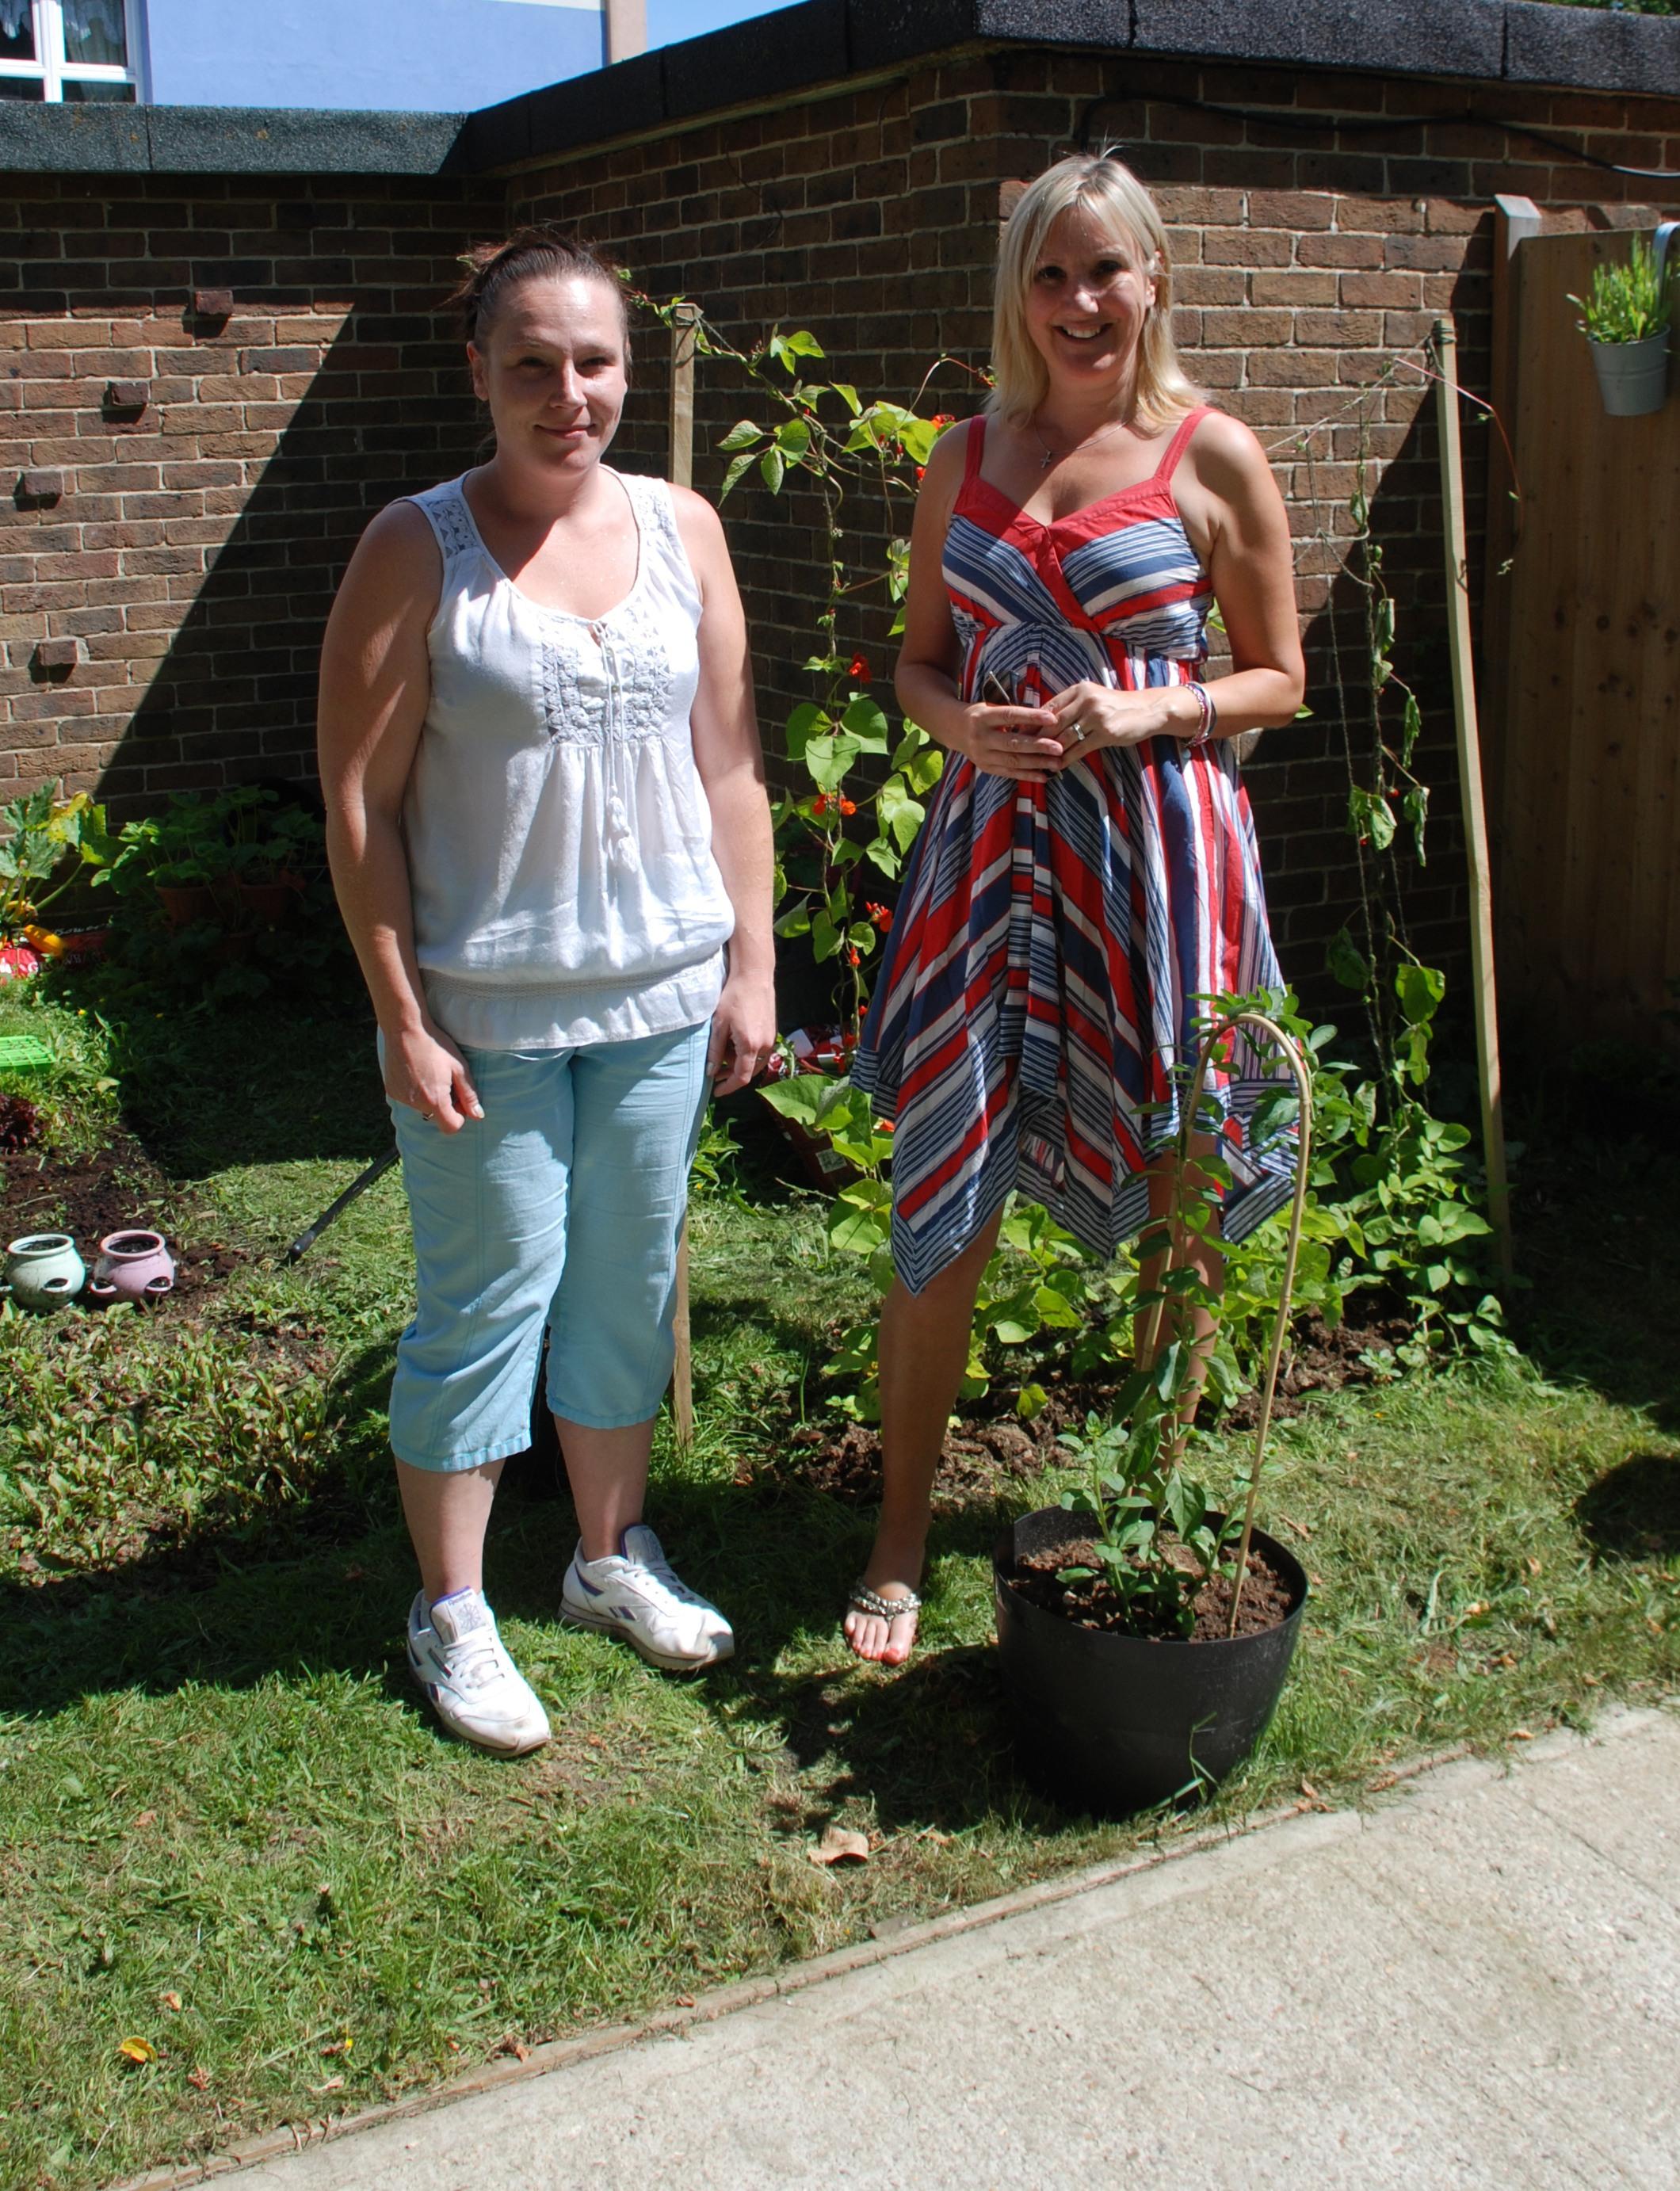 Caroline visits barclay house garden gosport for Barclay house